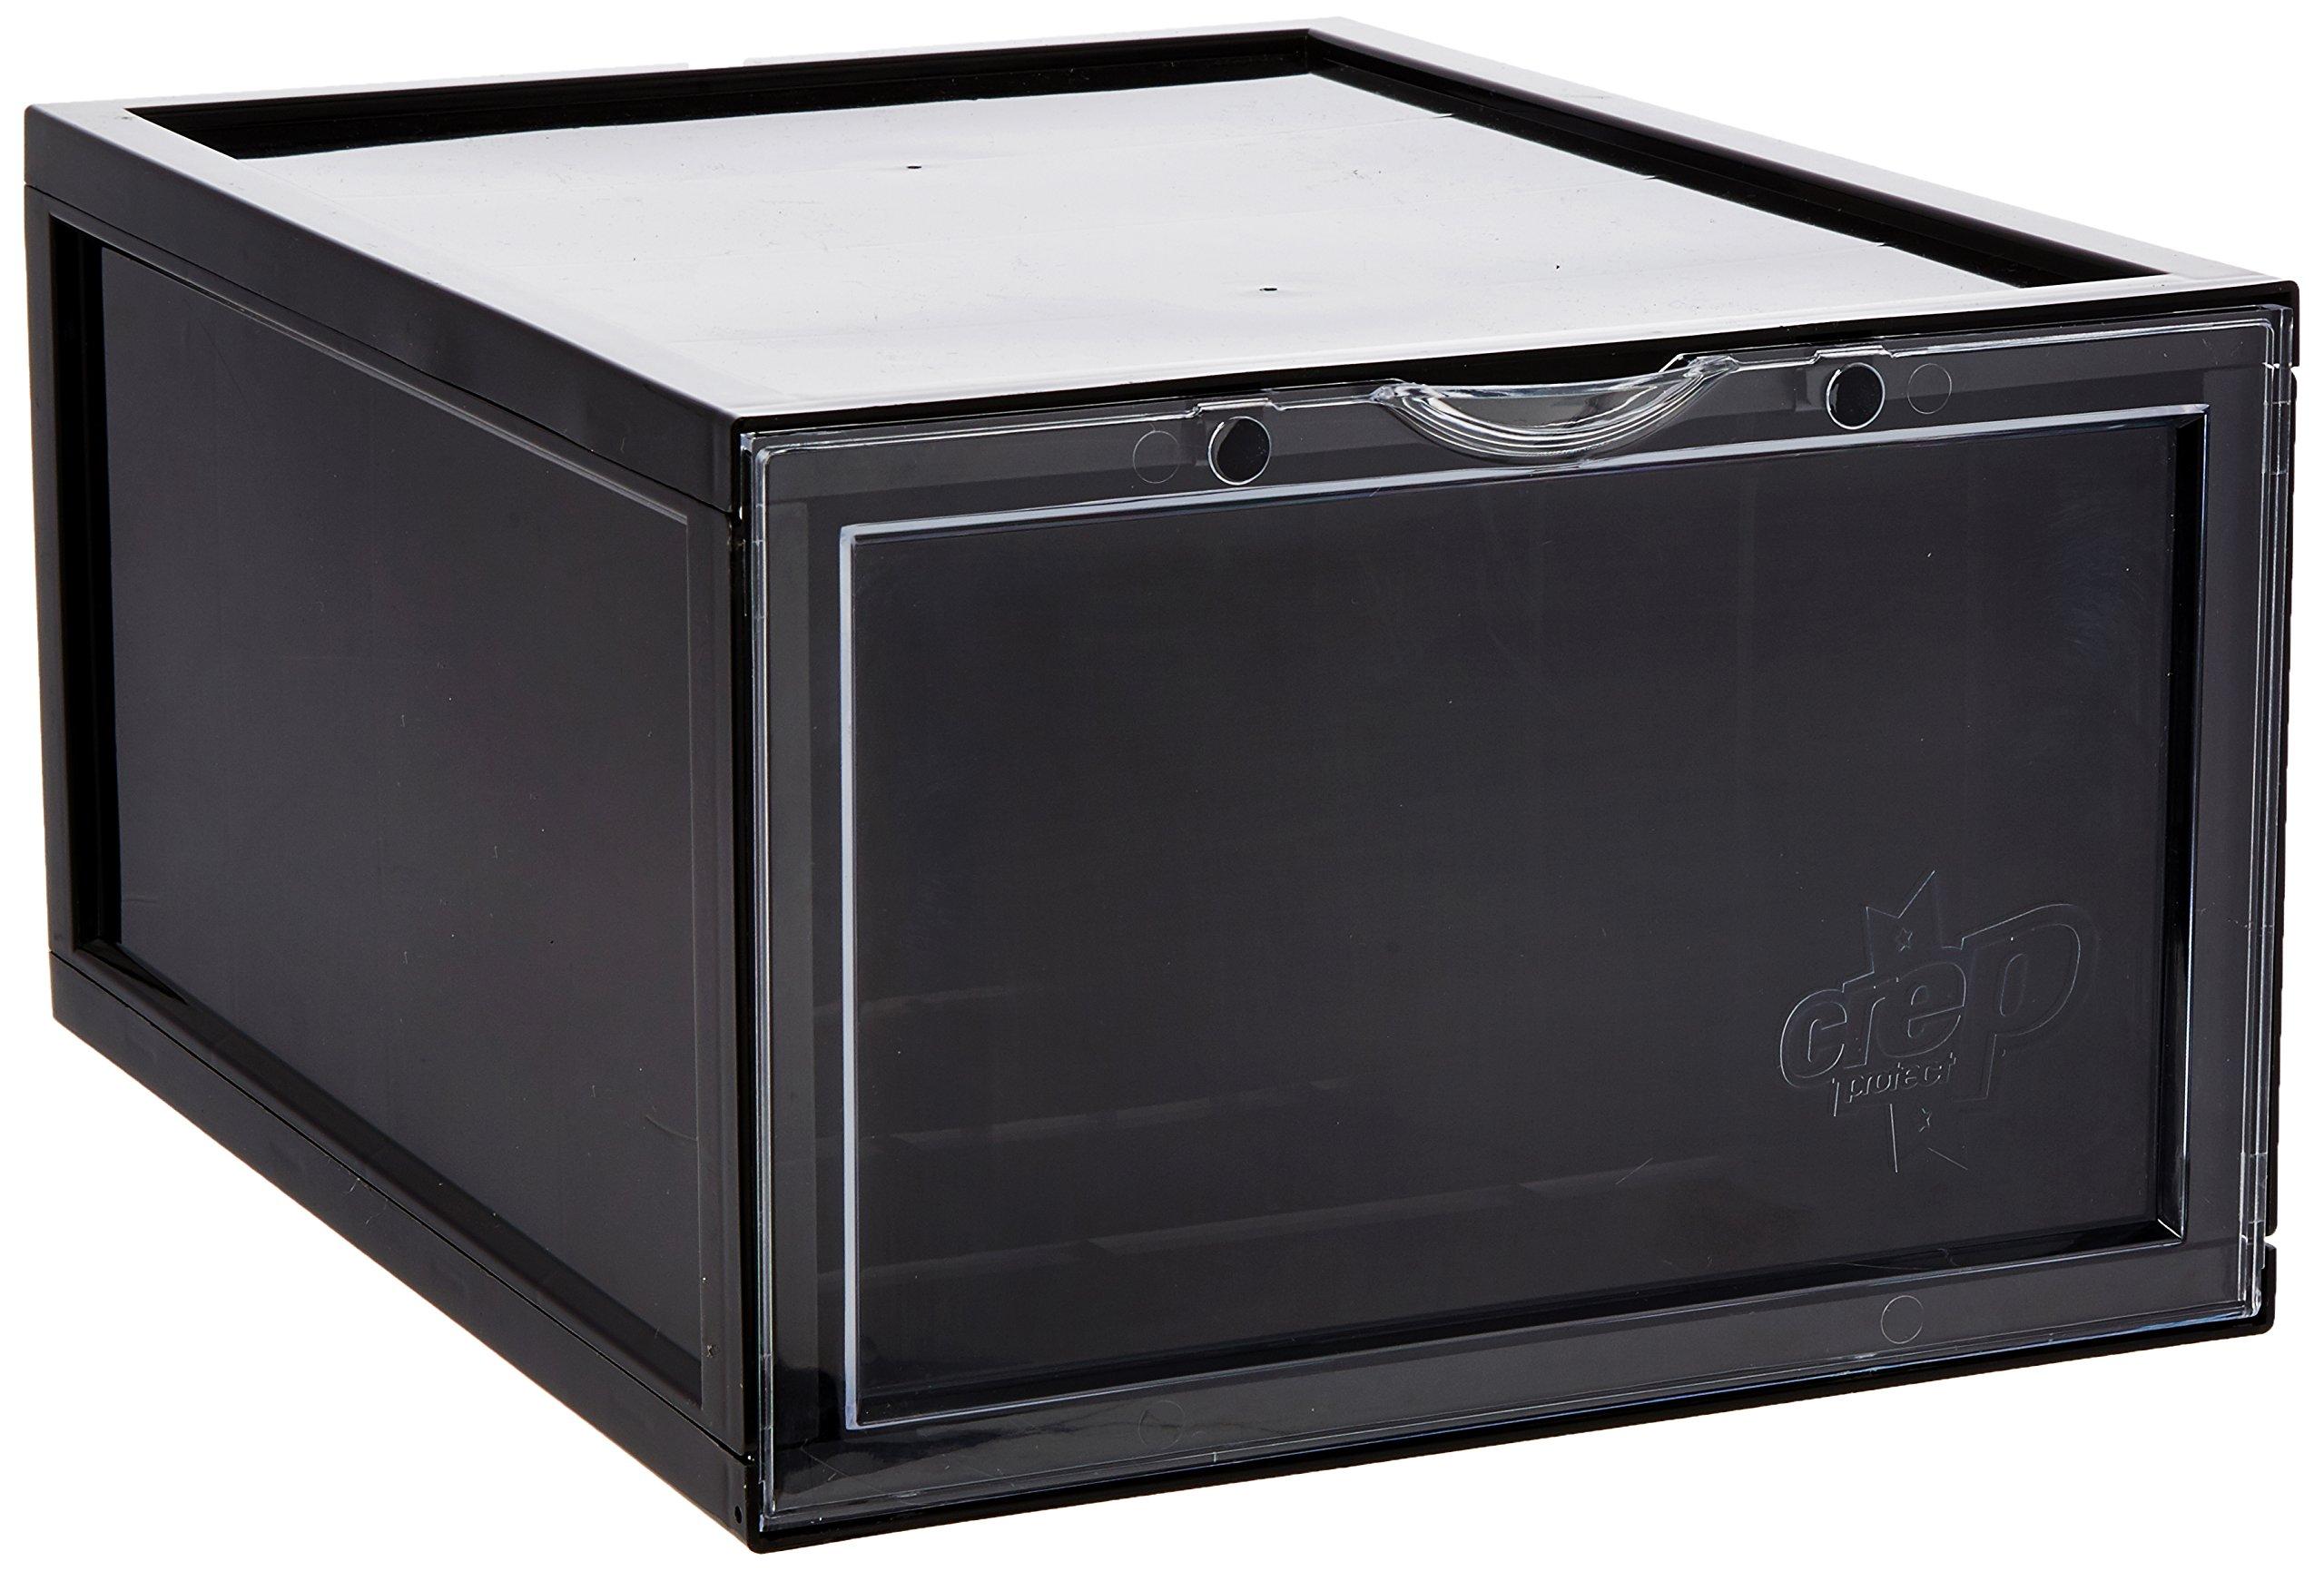 Crep Protect Crates Sneaker Storage Box